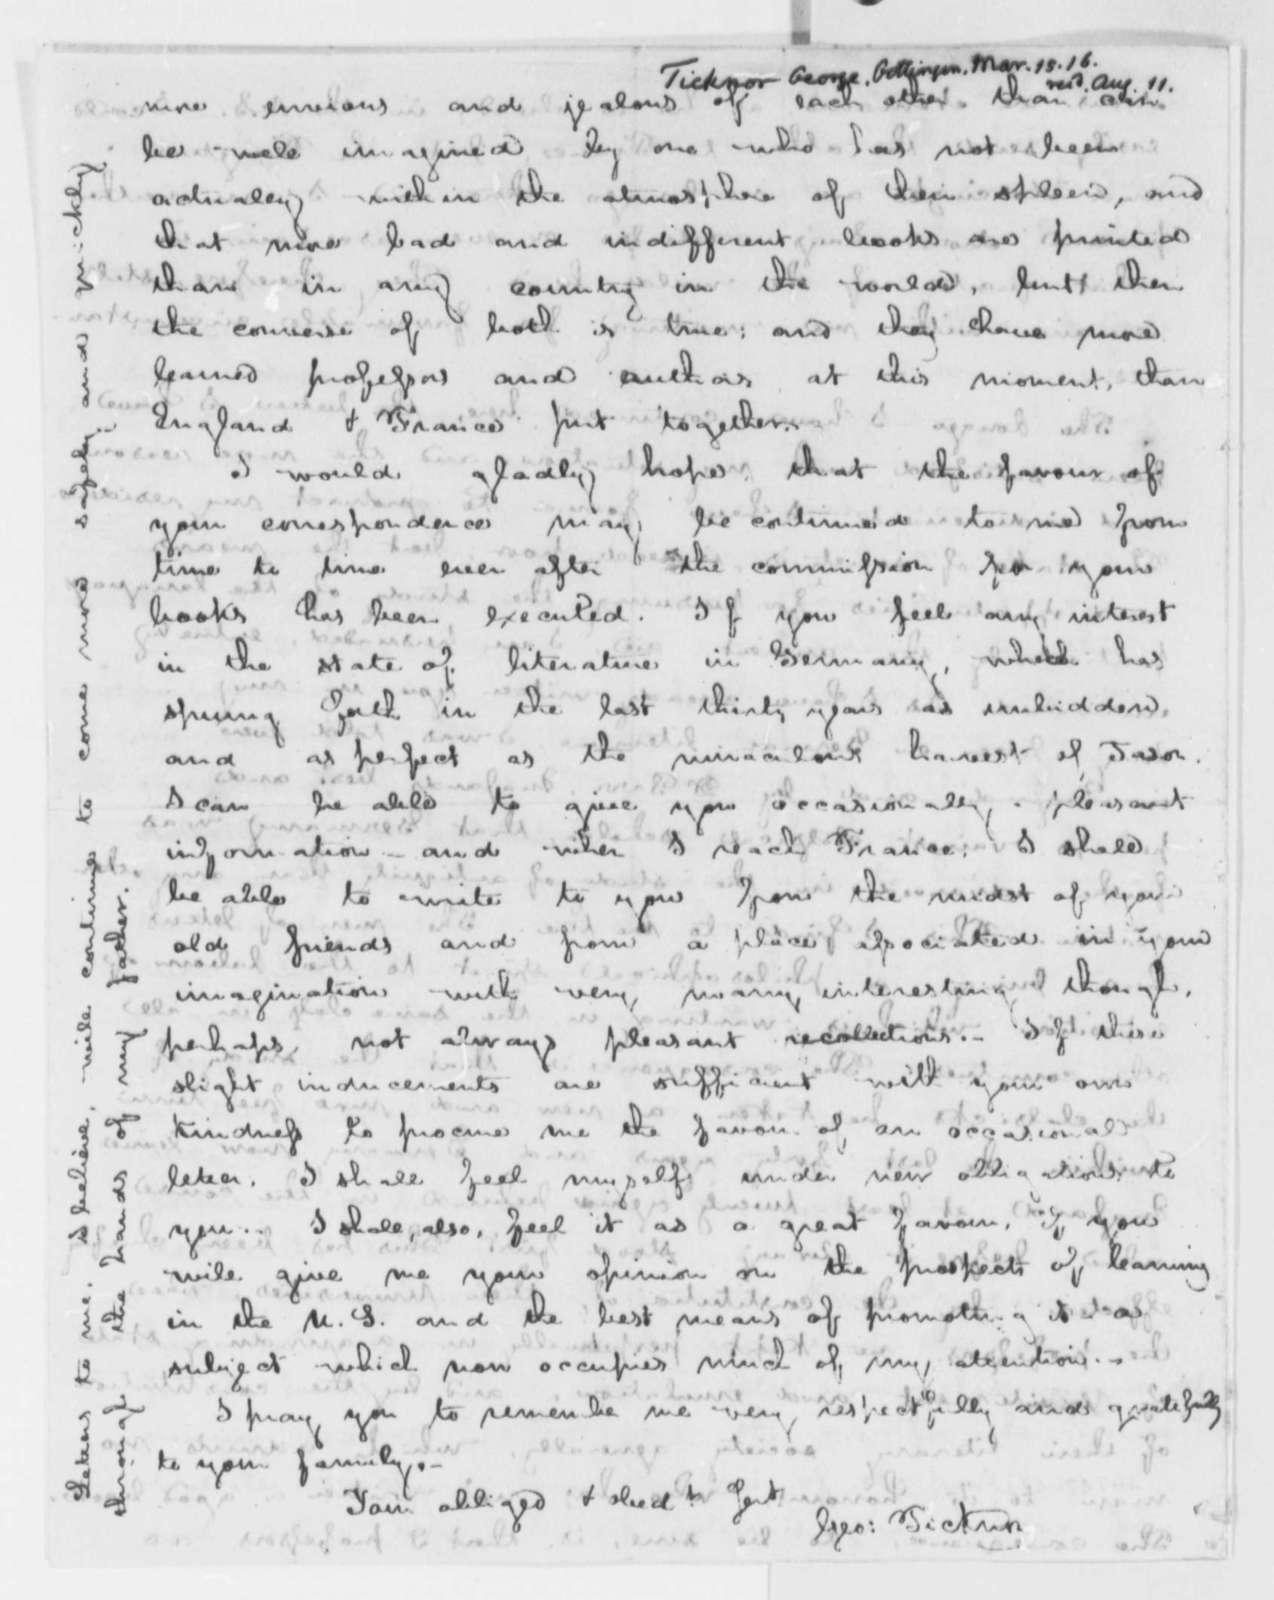 George Ticknor to Thomas Jefferson, March 15, 1816